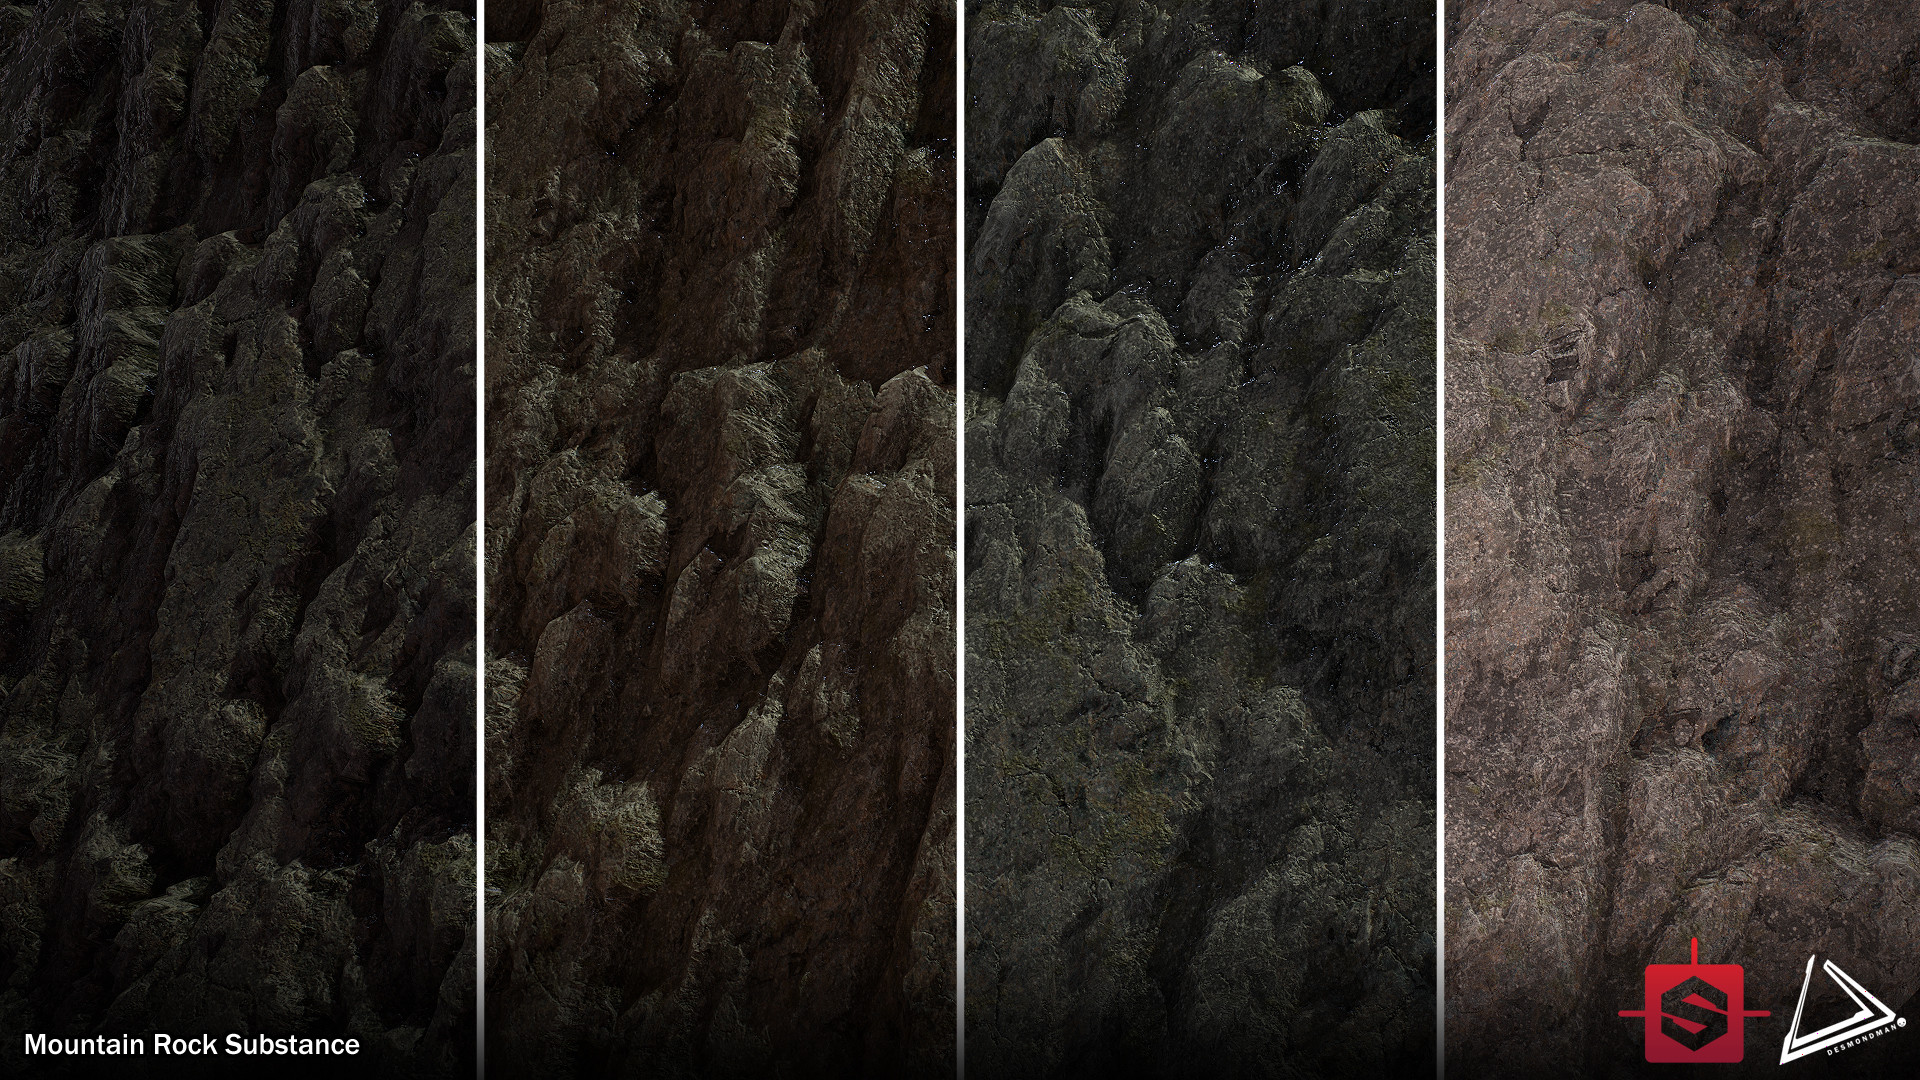 Desmond man sbwc mountainrock01 showcase05